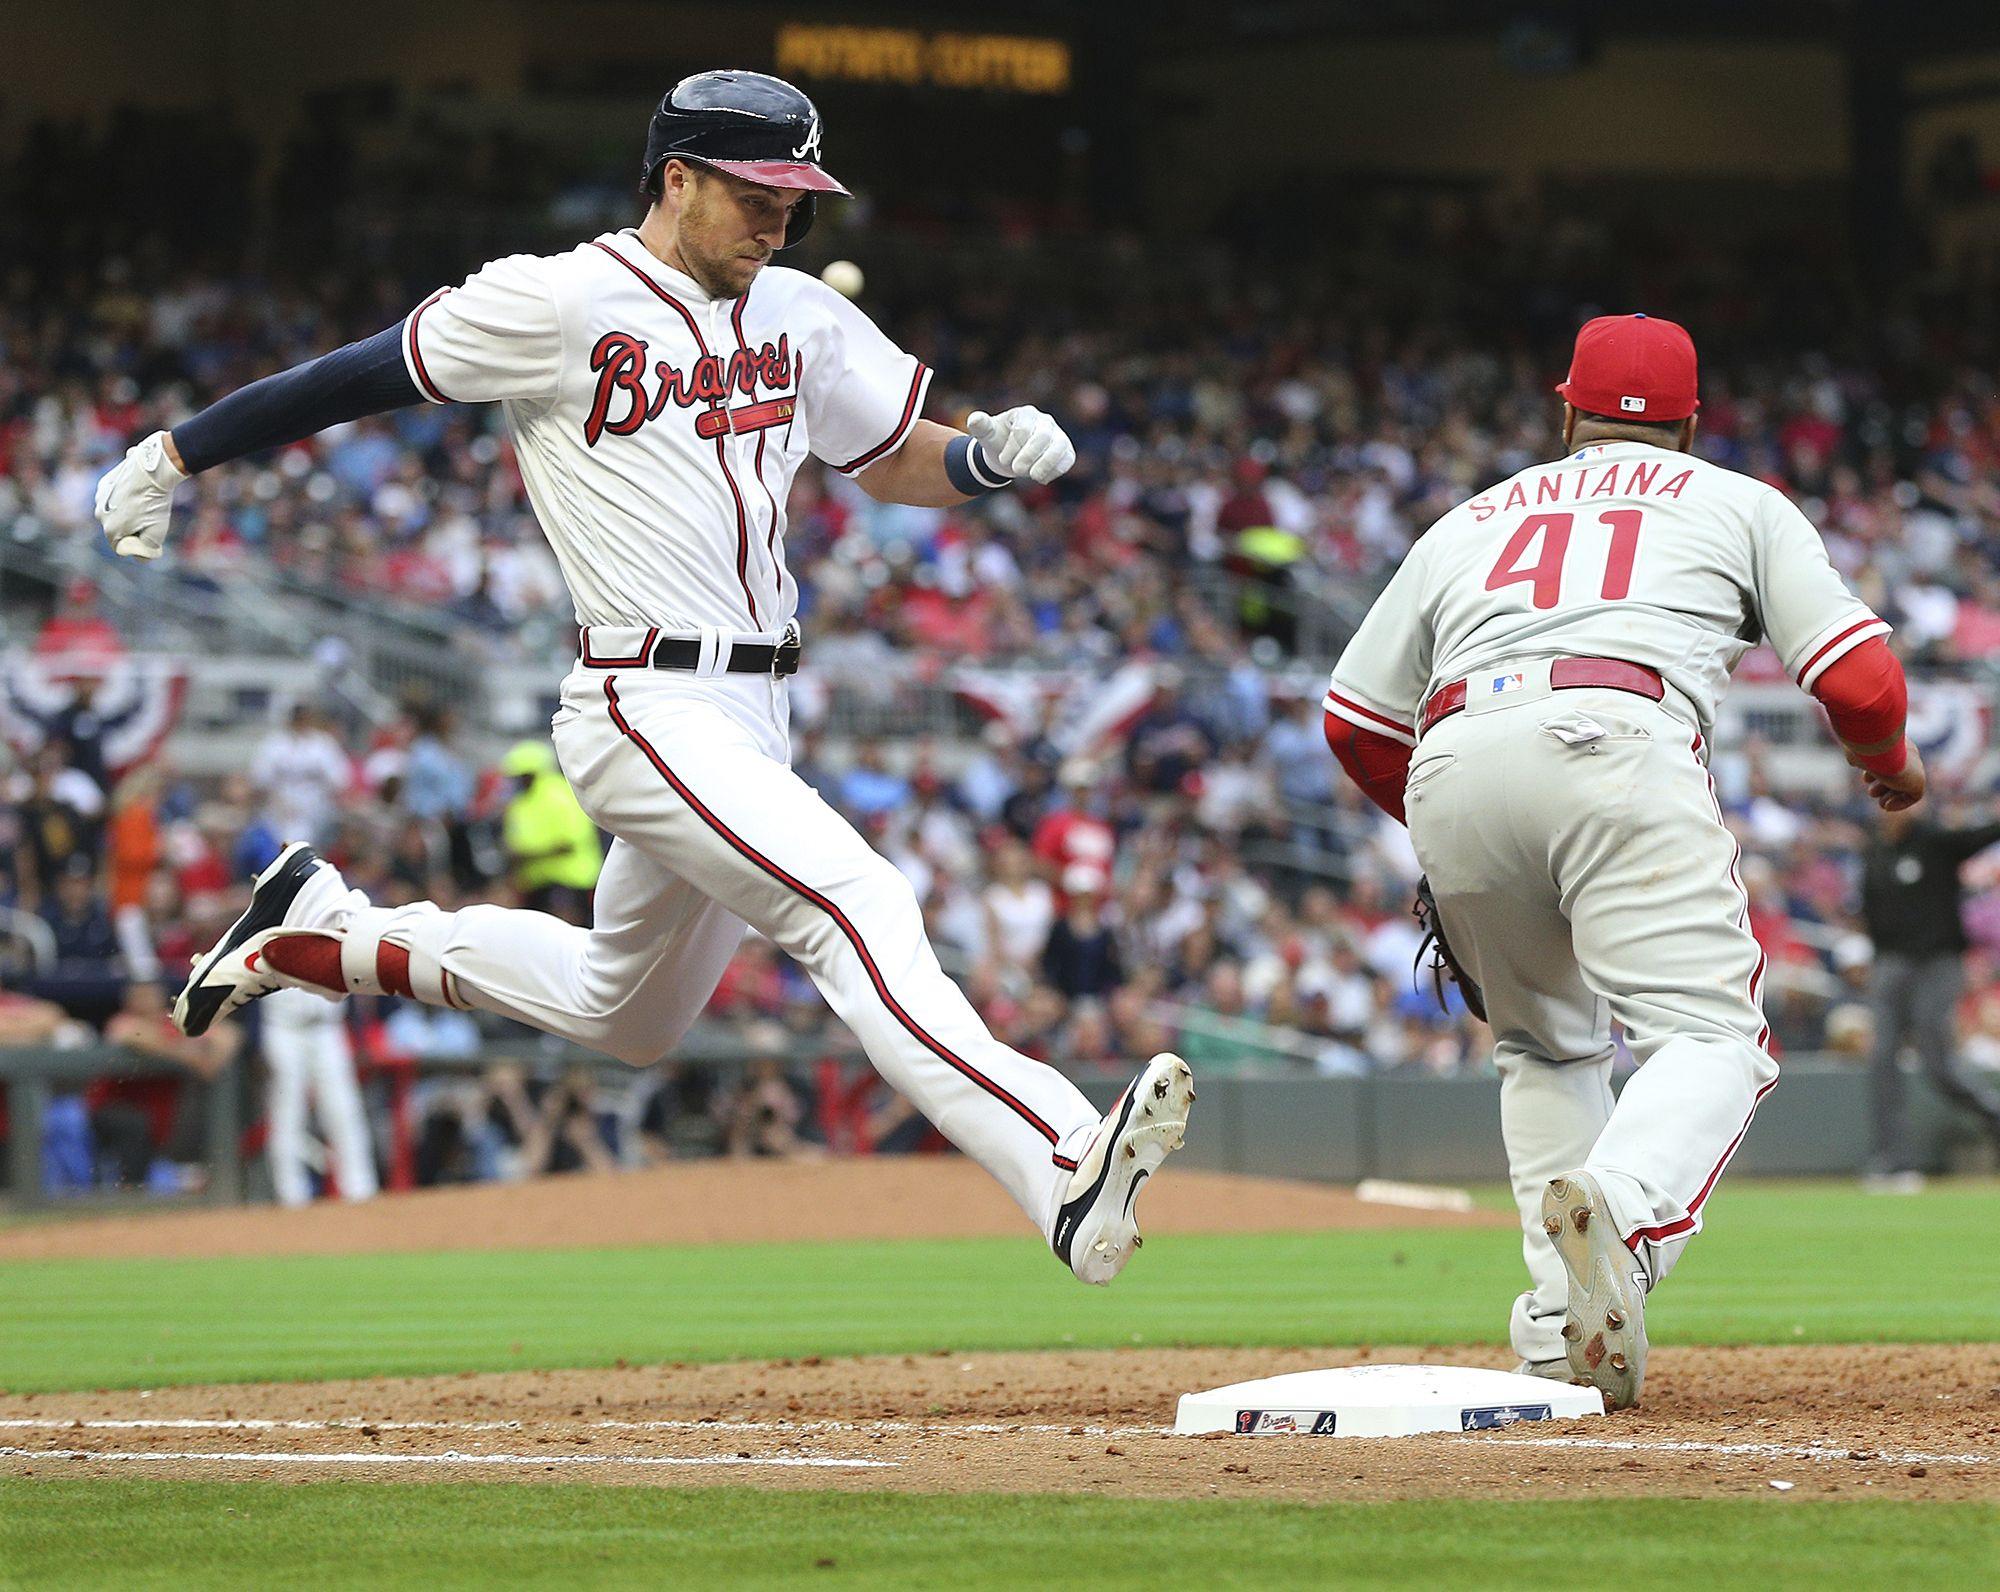 March 29 2018 Atlanta Atlanta Braves Outfielder Lane Adams Beats Out The Throw To Phillies First Baseman Carlos Sant Atlanta Braves The Outfield Mlb Baseball